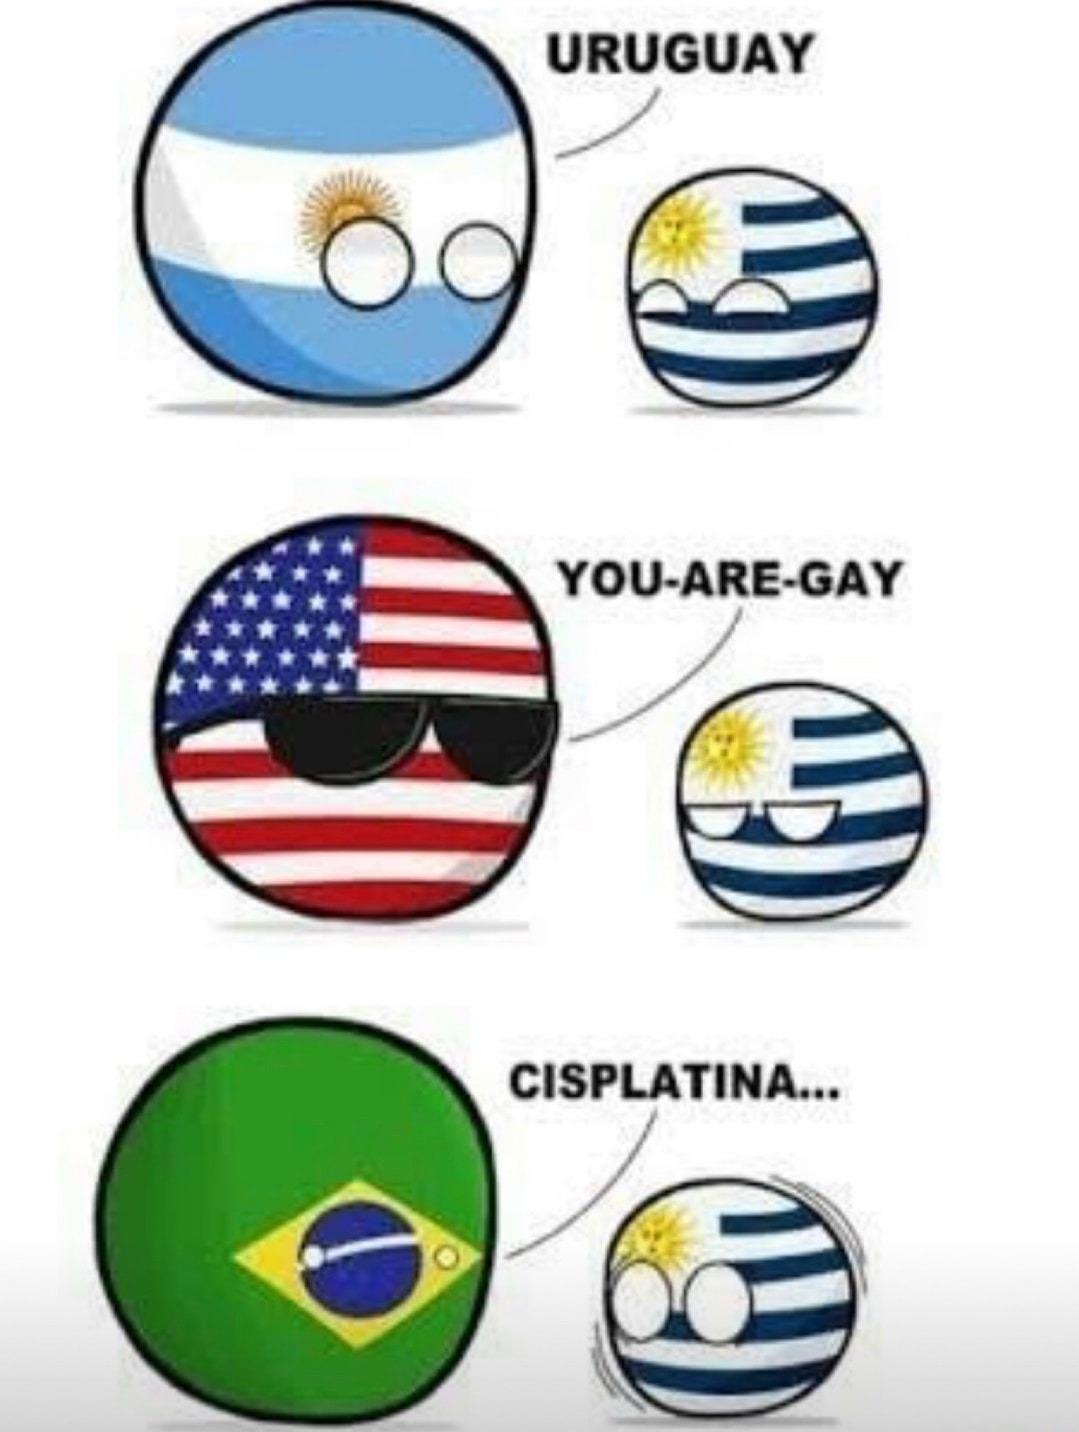 Nossa pequena guerra latina - meme